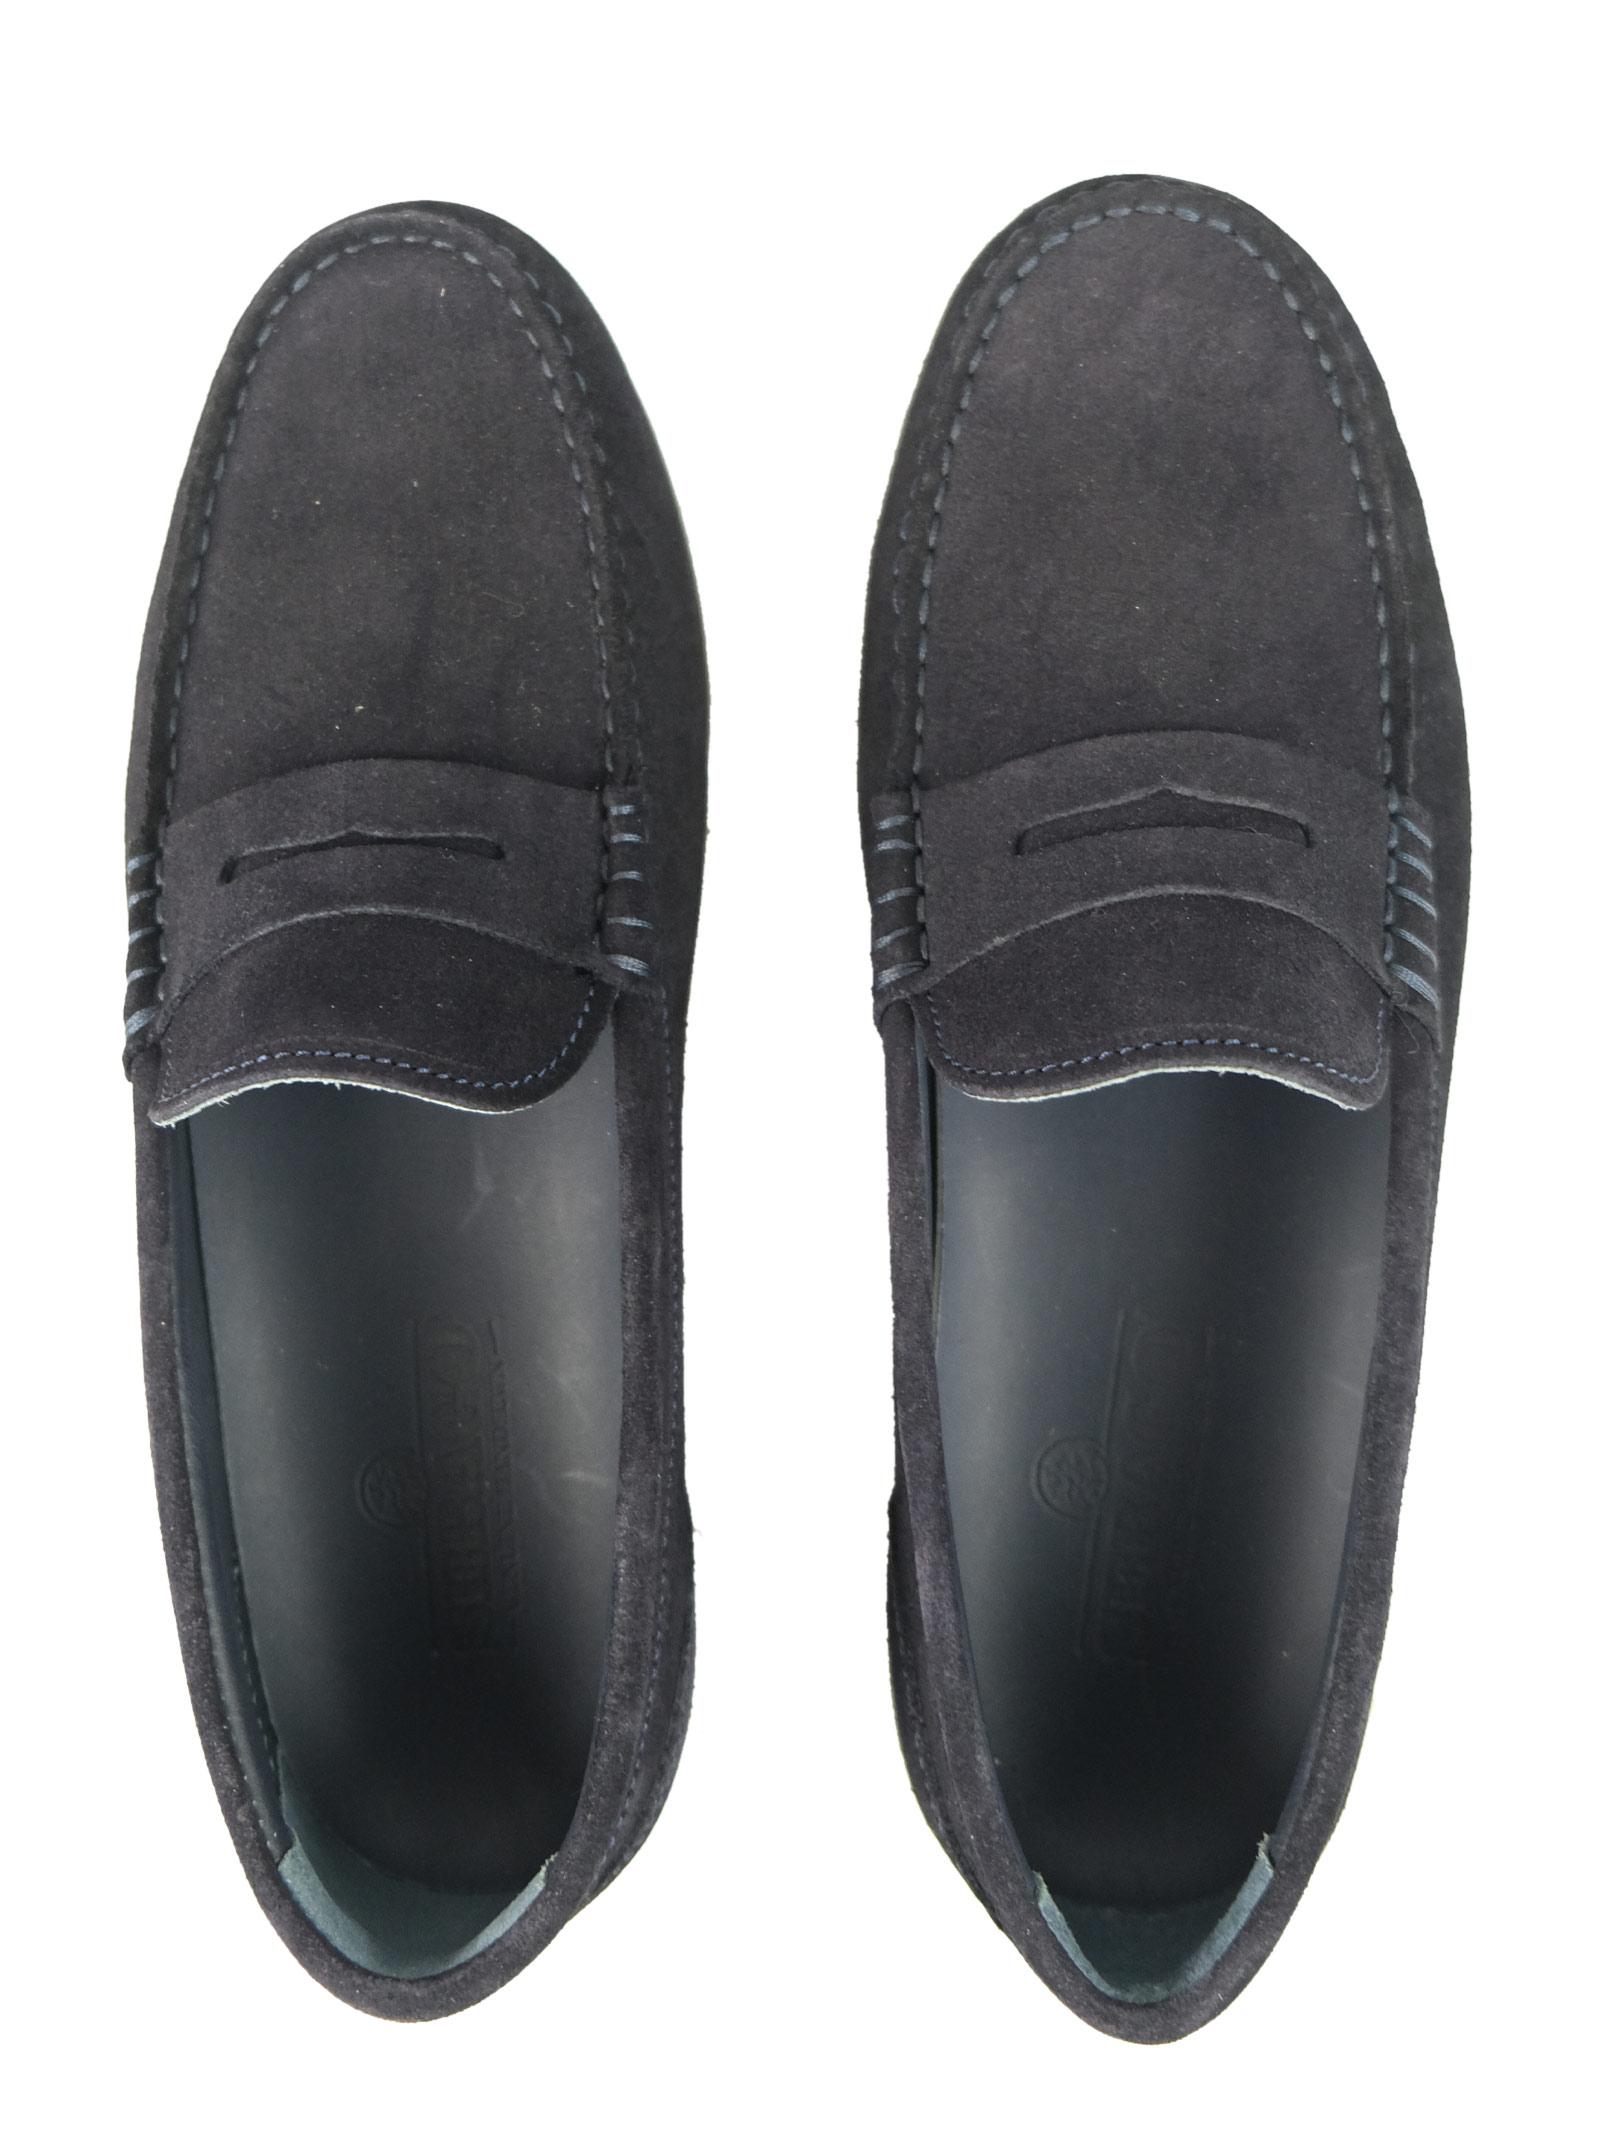 BYRON SUEDE DRIVING MOCS  SEBAGO | Shoes | 7001620908